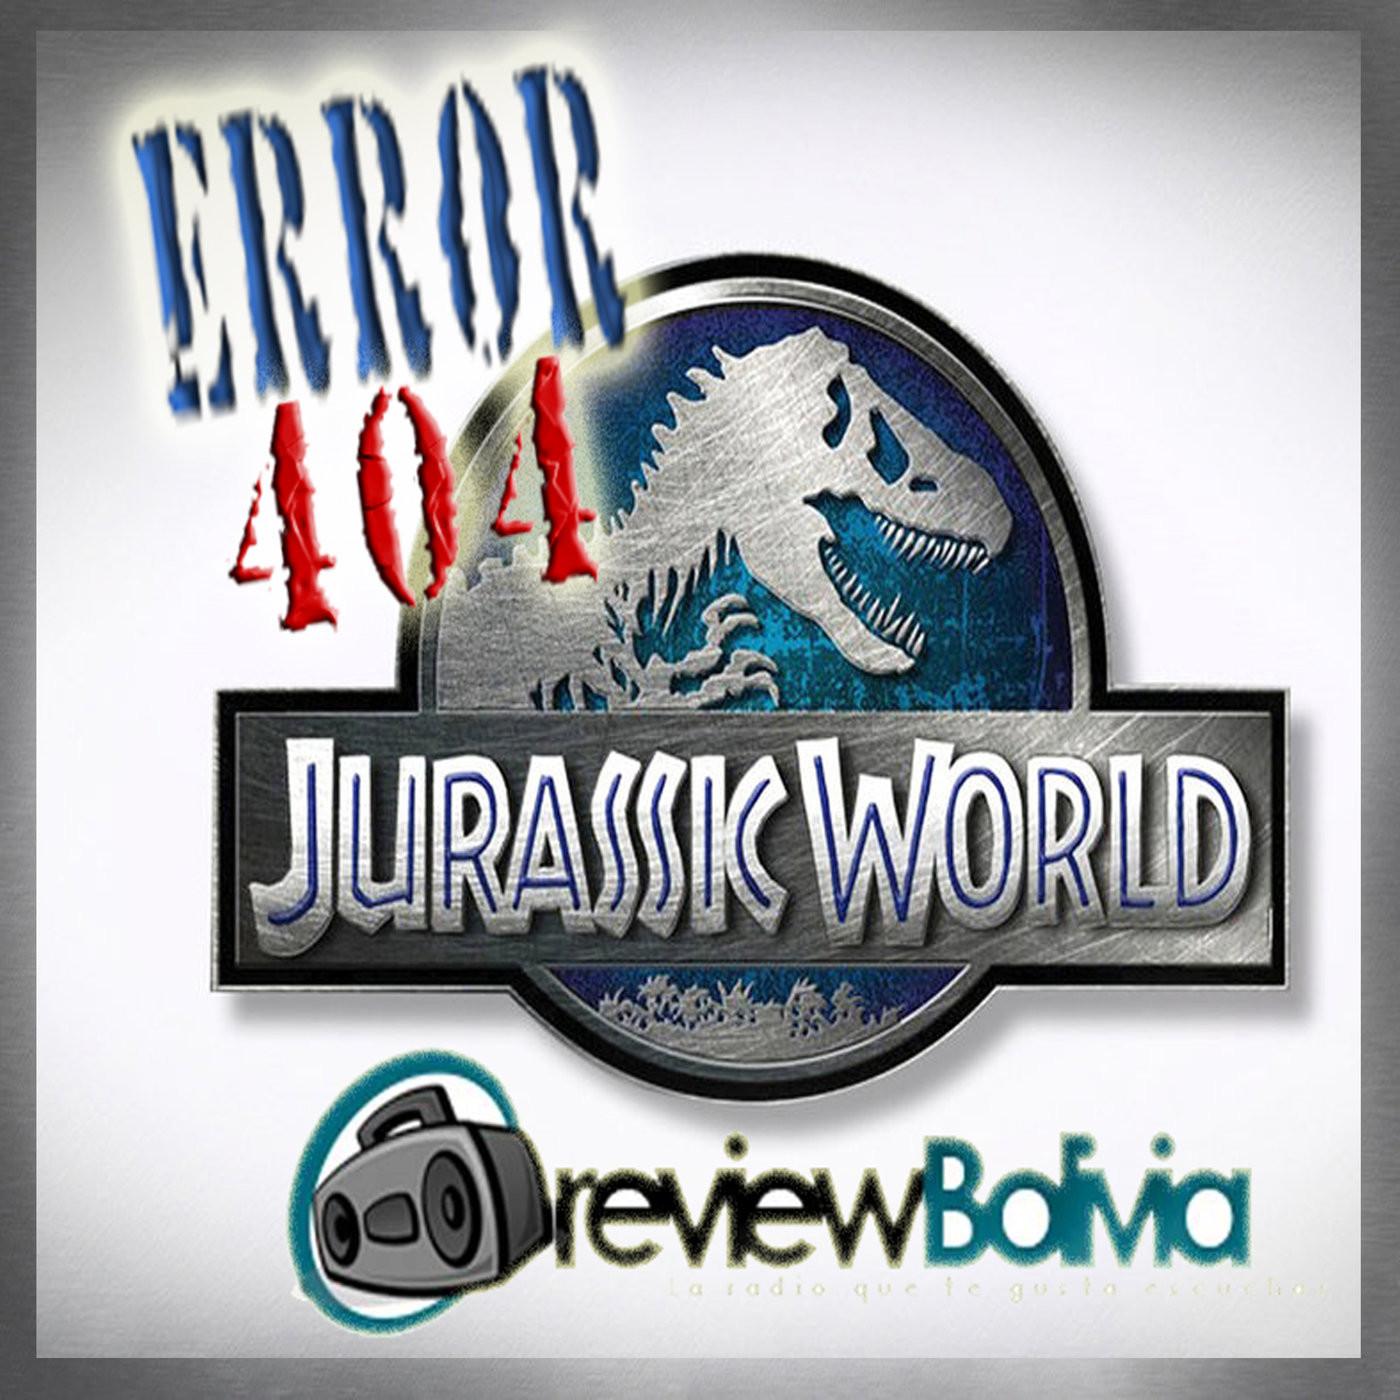 <![CDATA[Jurassic World - Error 404 Prog 03]]>